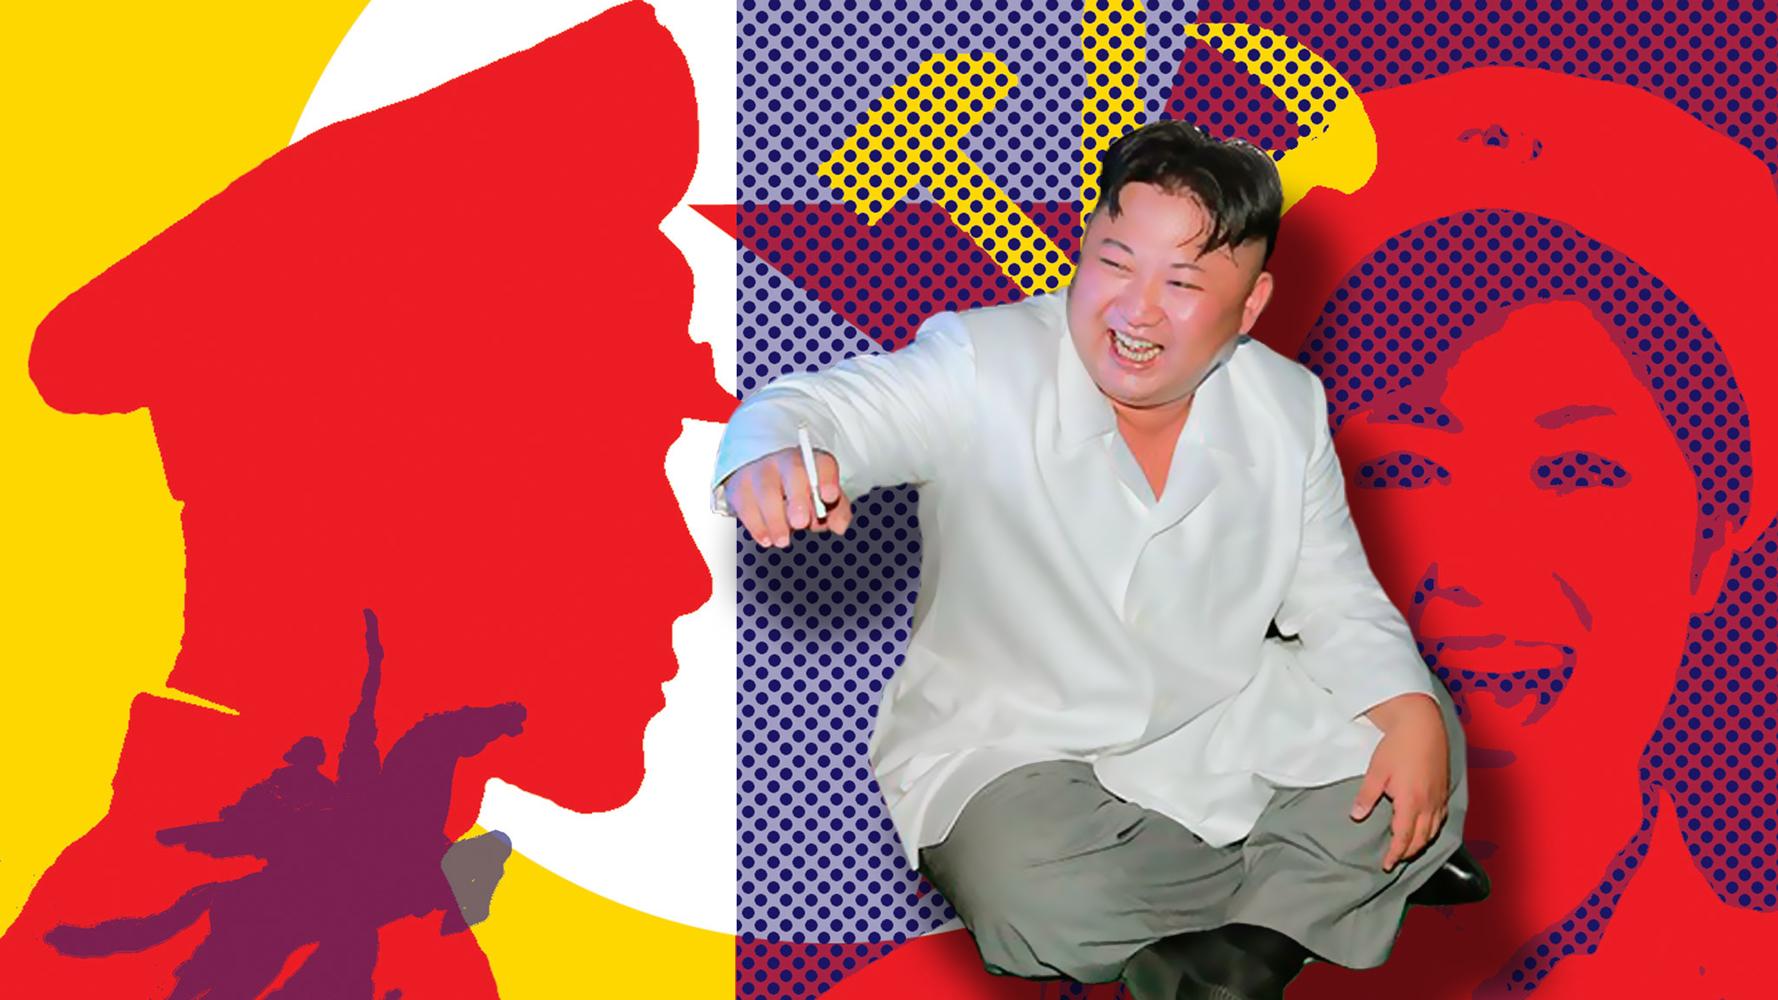 Site ul de dating Coreea de Nord om cautand o coasta de nord